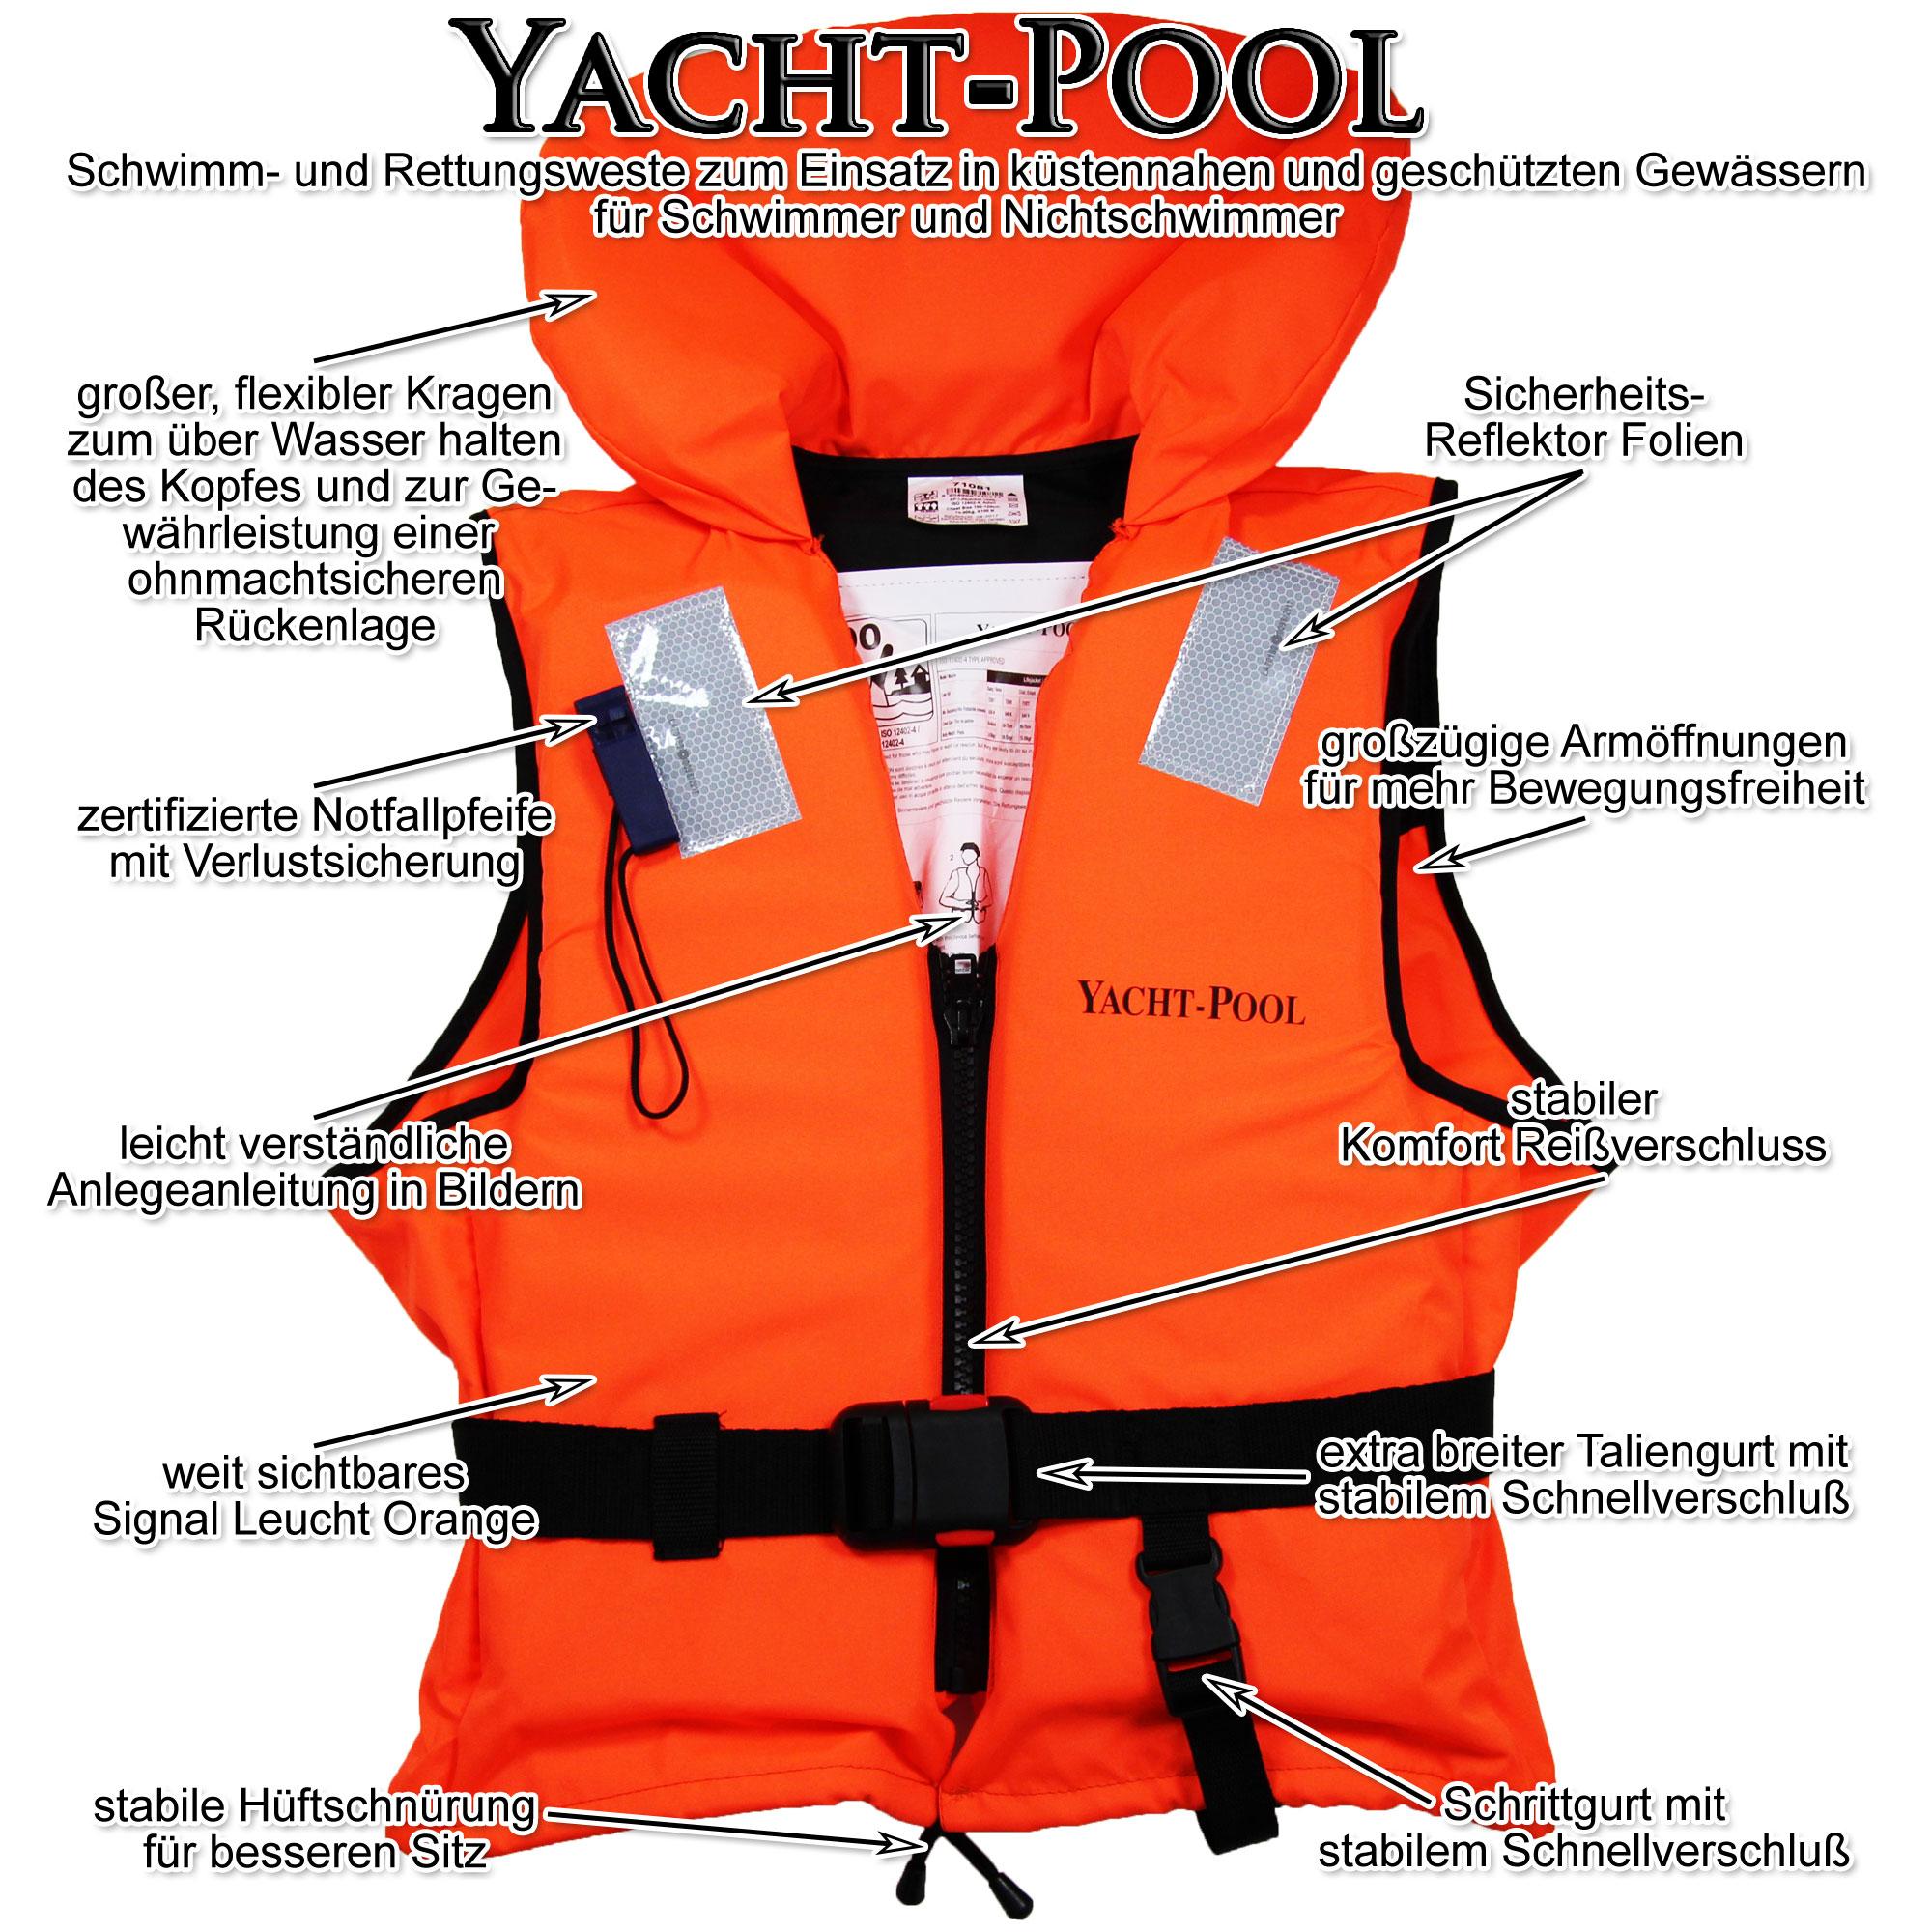 YACHT-POOL 100N Feststoffrettungsweste 30-40 kg Rettungsweste Schwimmweste ISO12